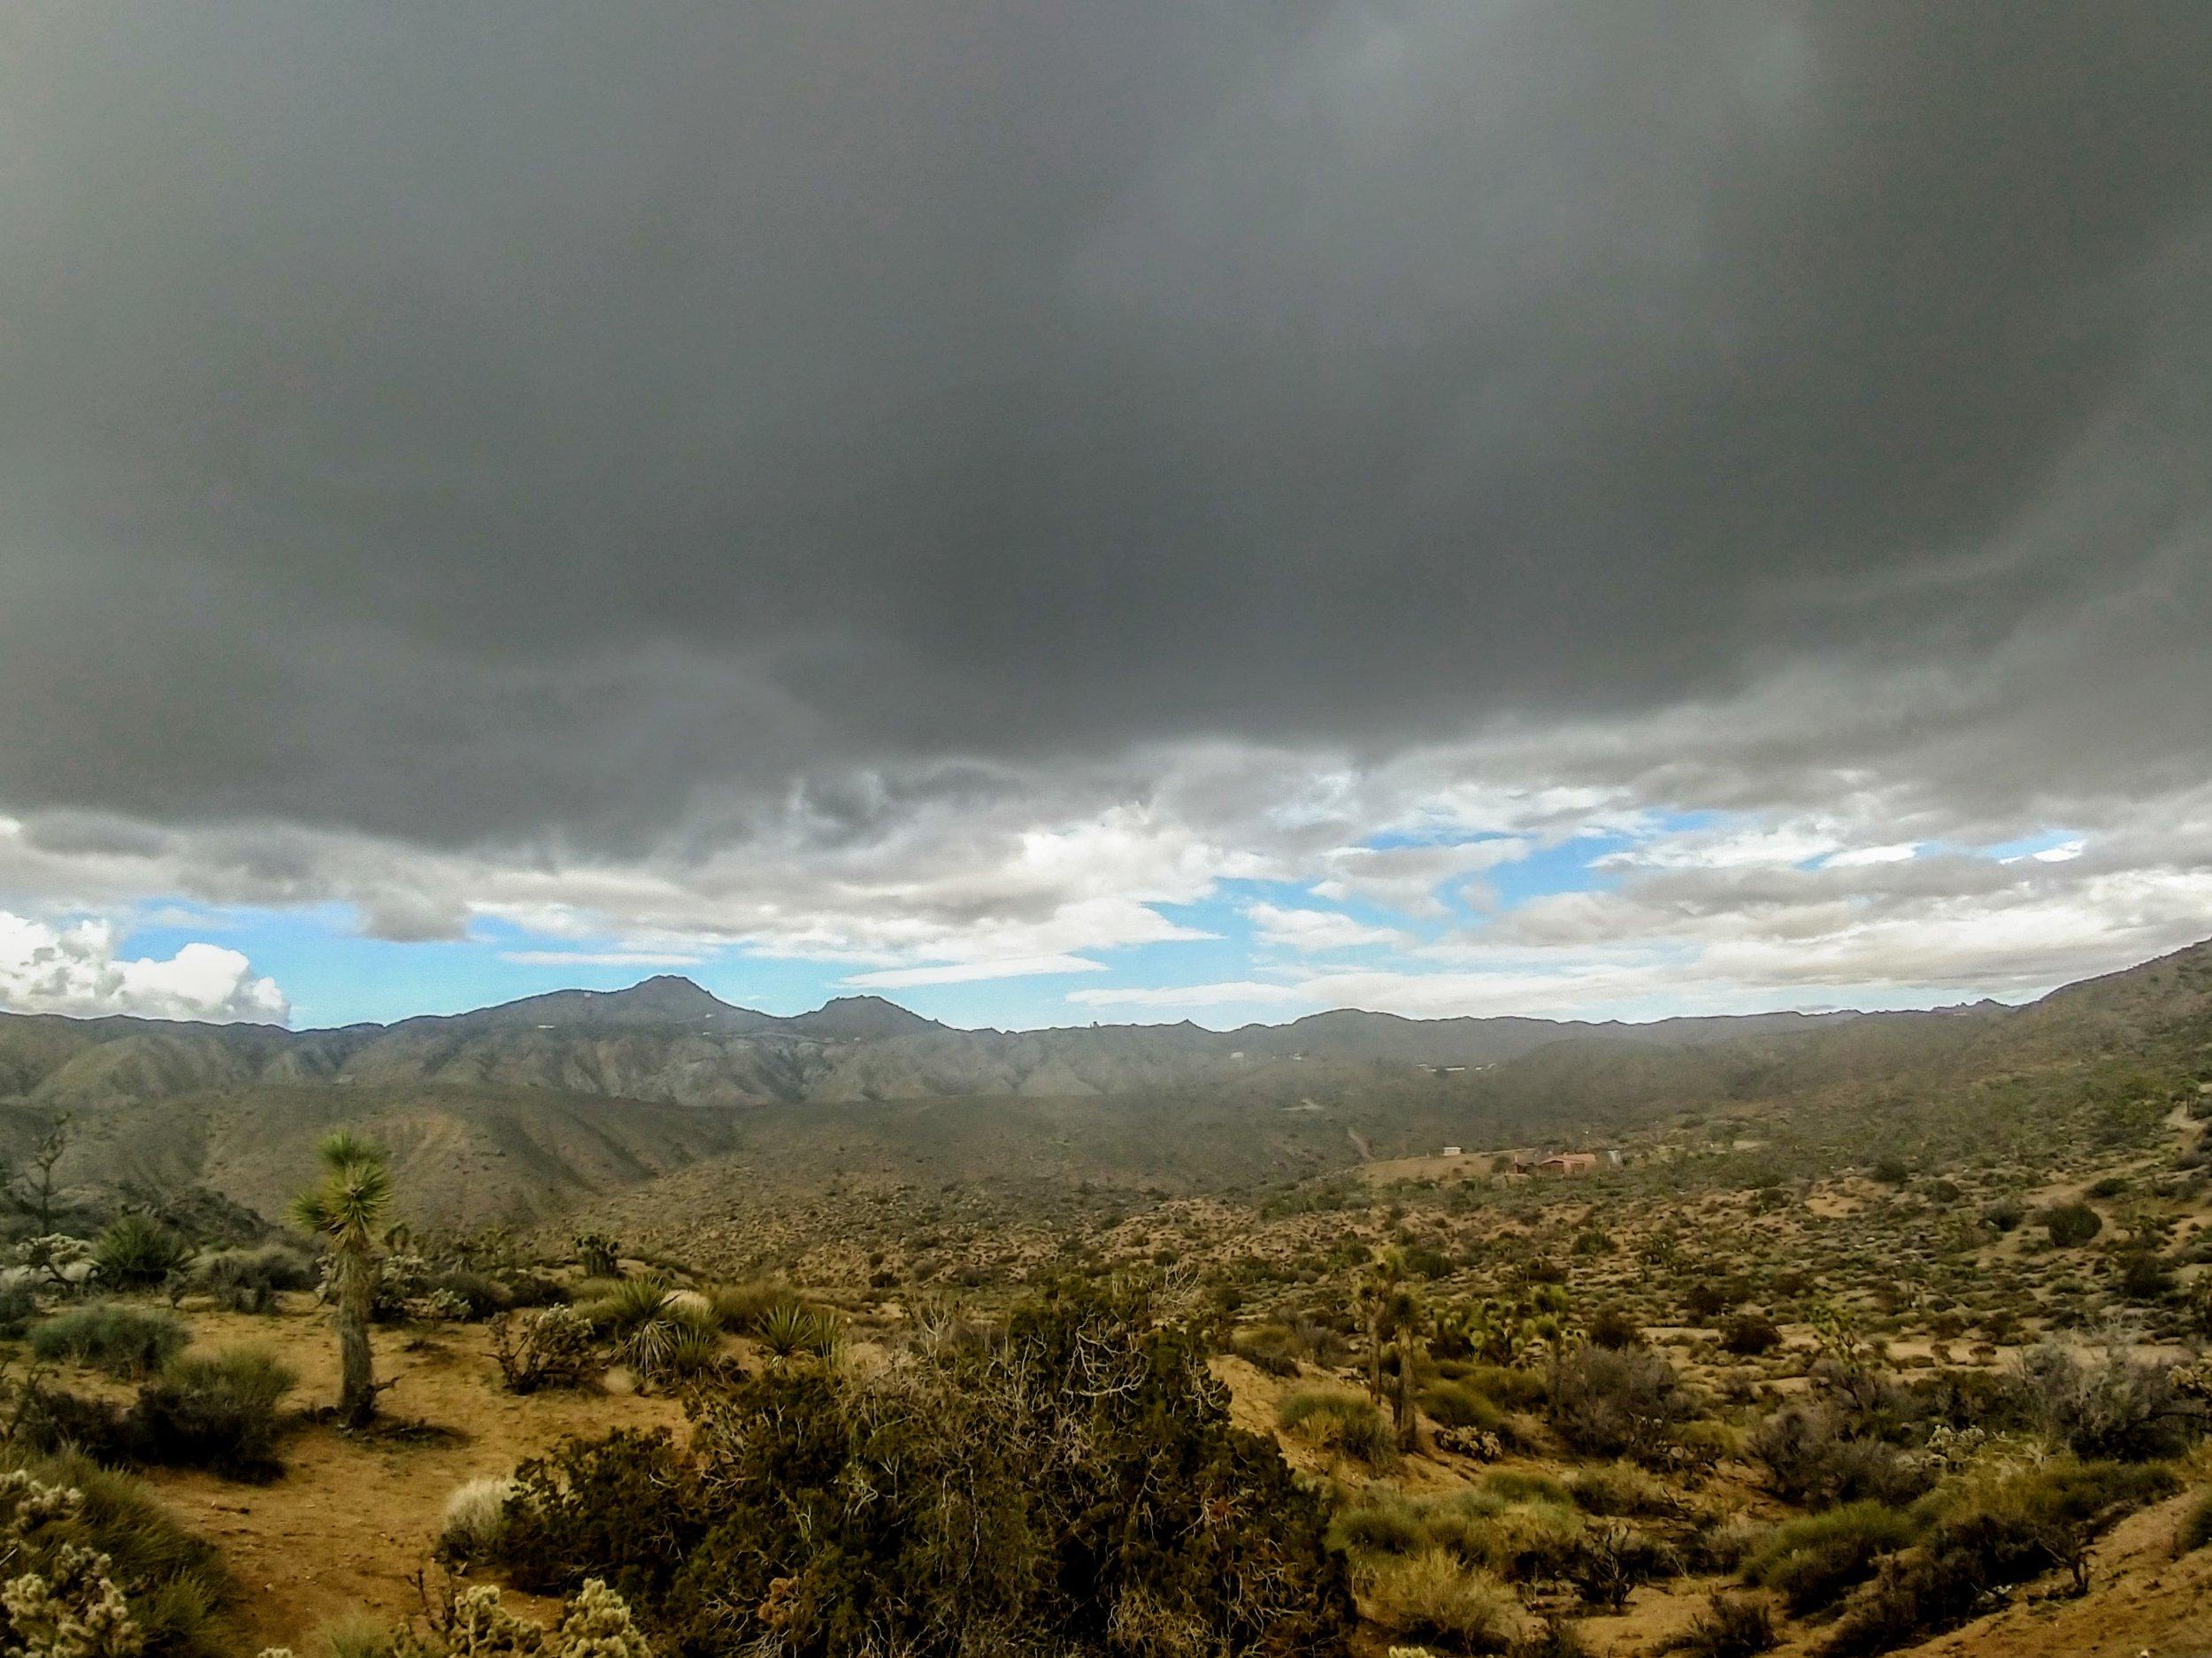 Rain clouds - Yucca Valley, CA